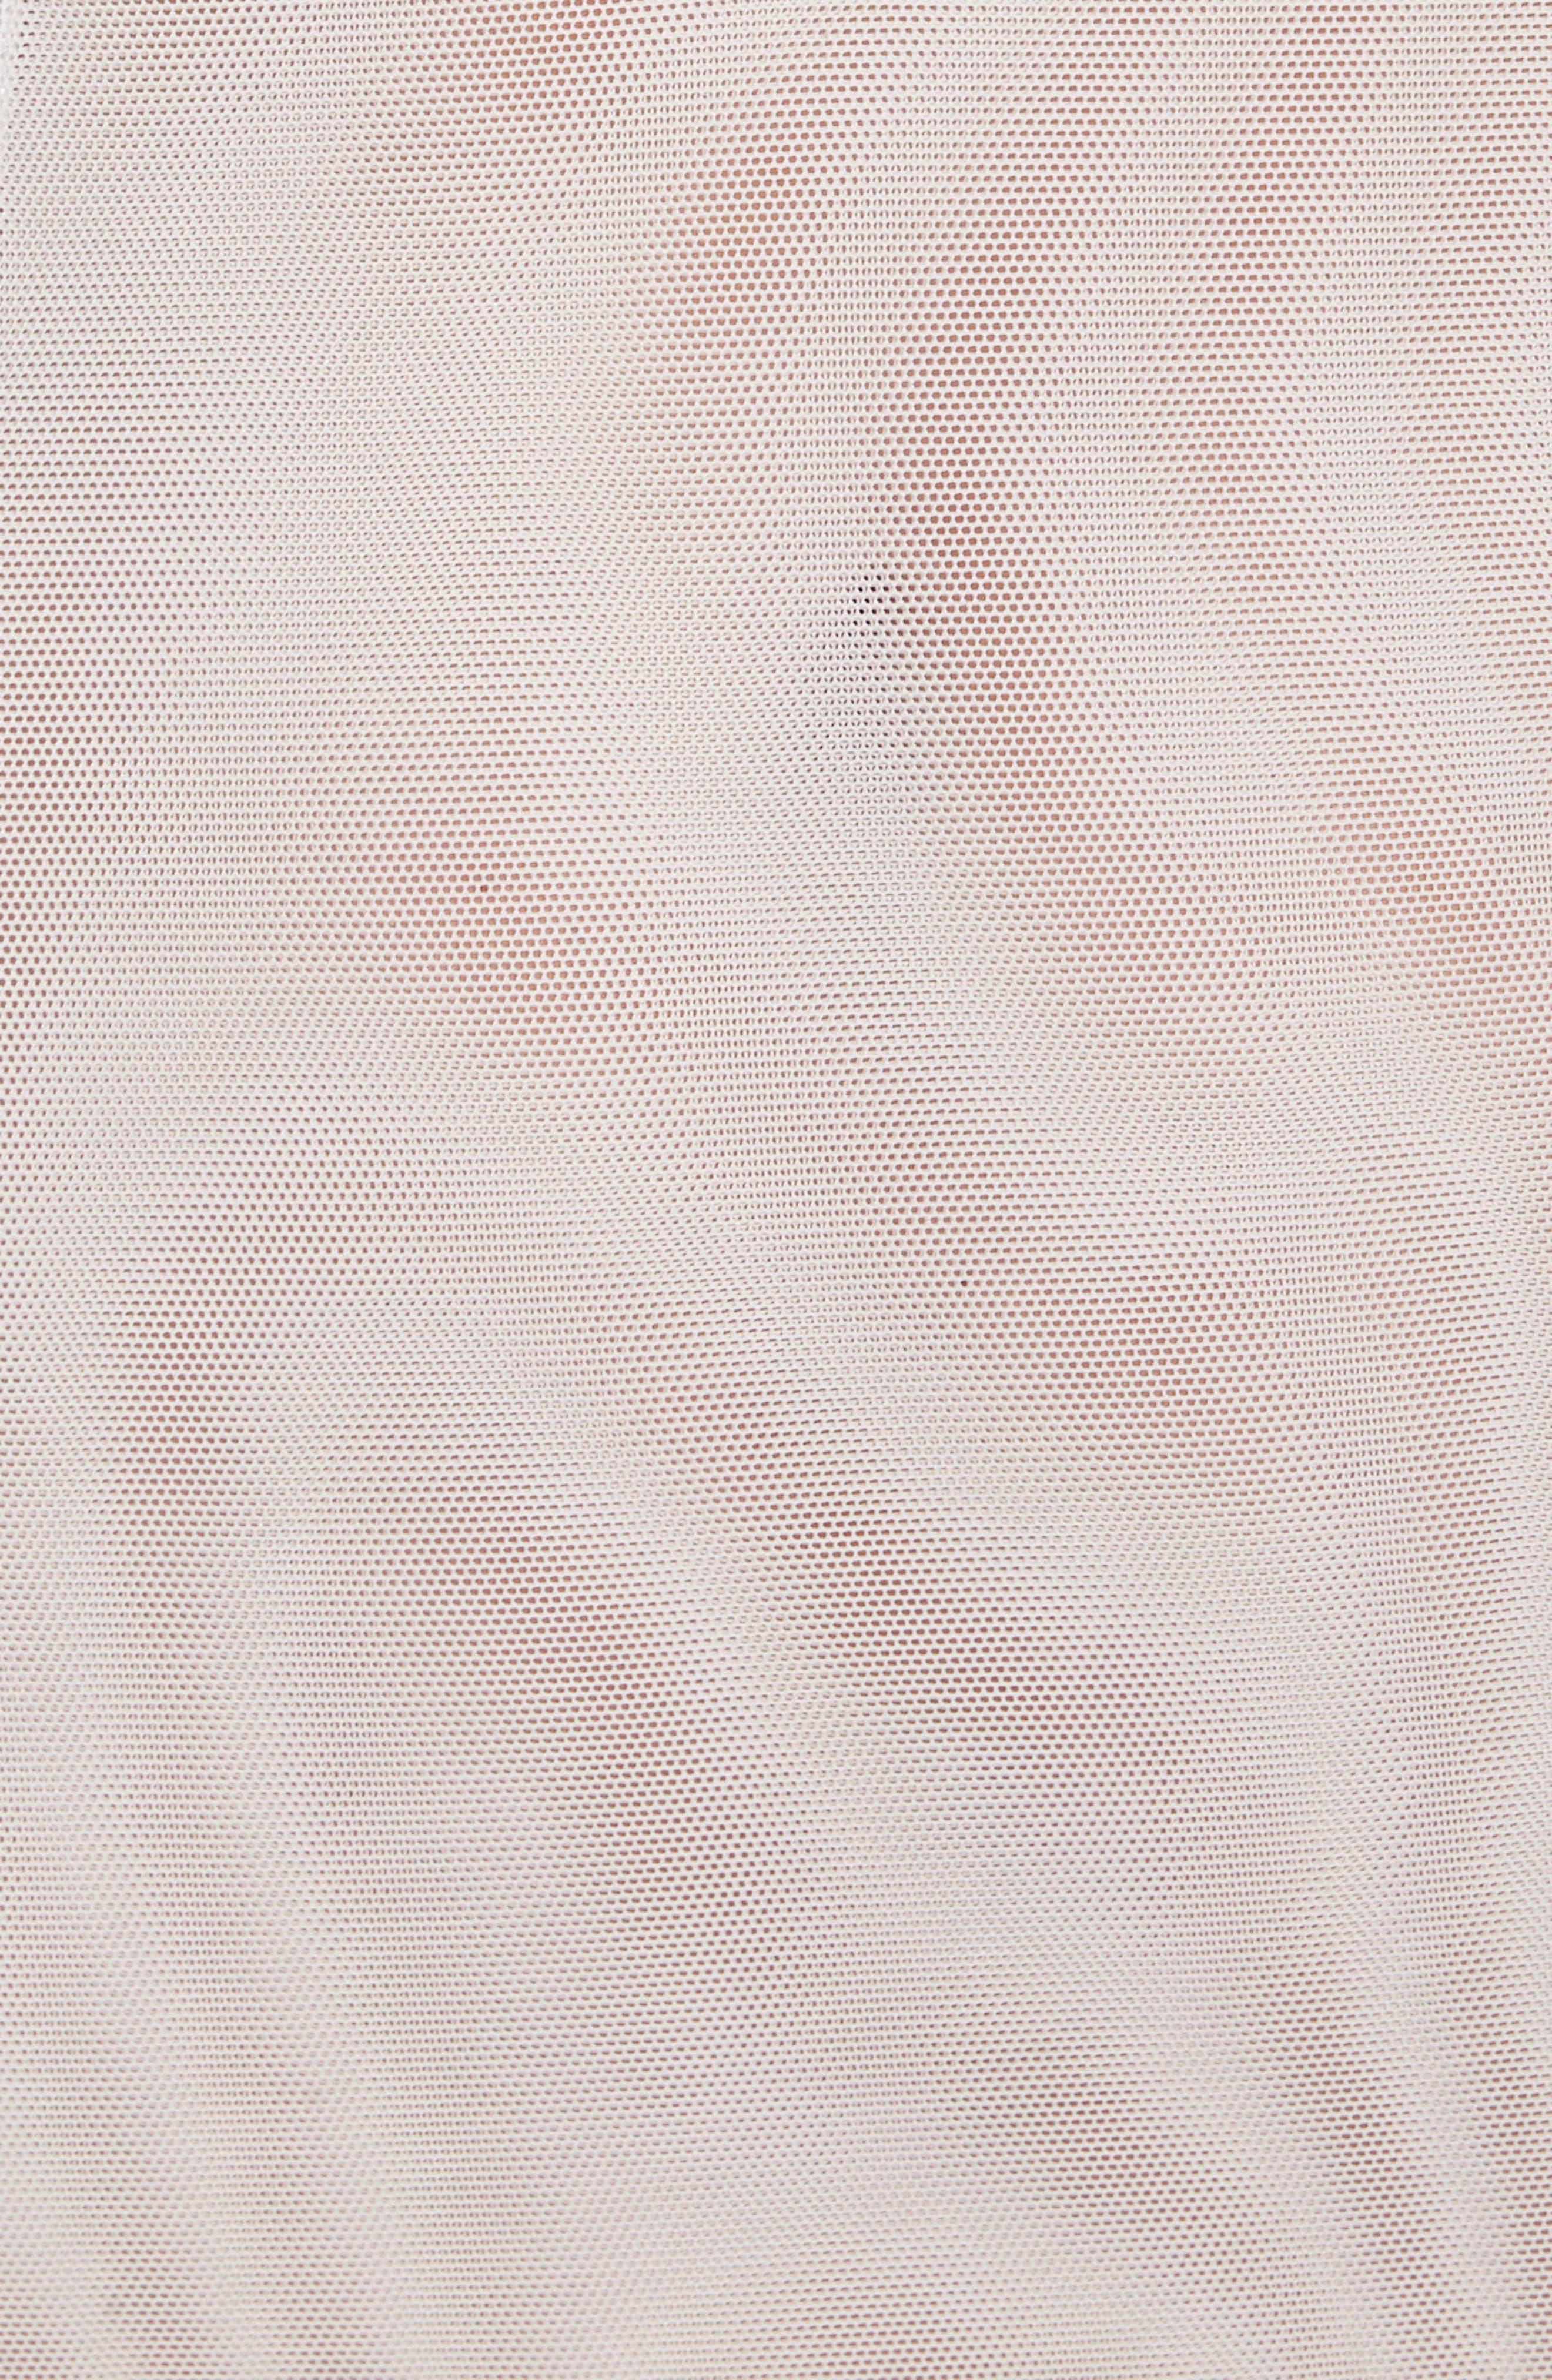 Tori Thong Bodysuit,                             Alternate thumbnail 6, color,                             Ivory